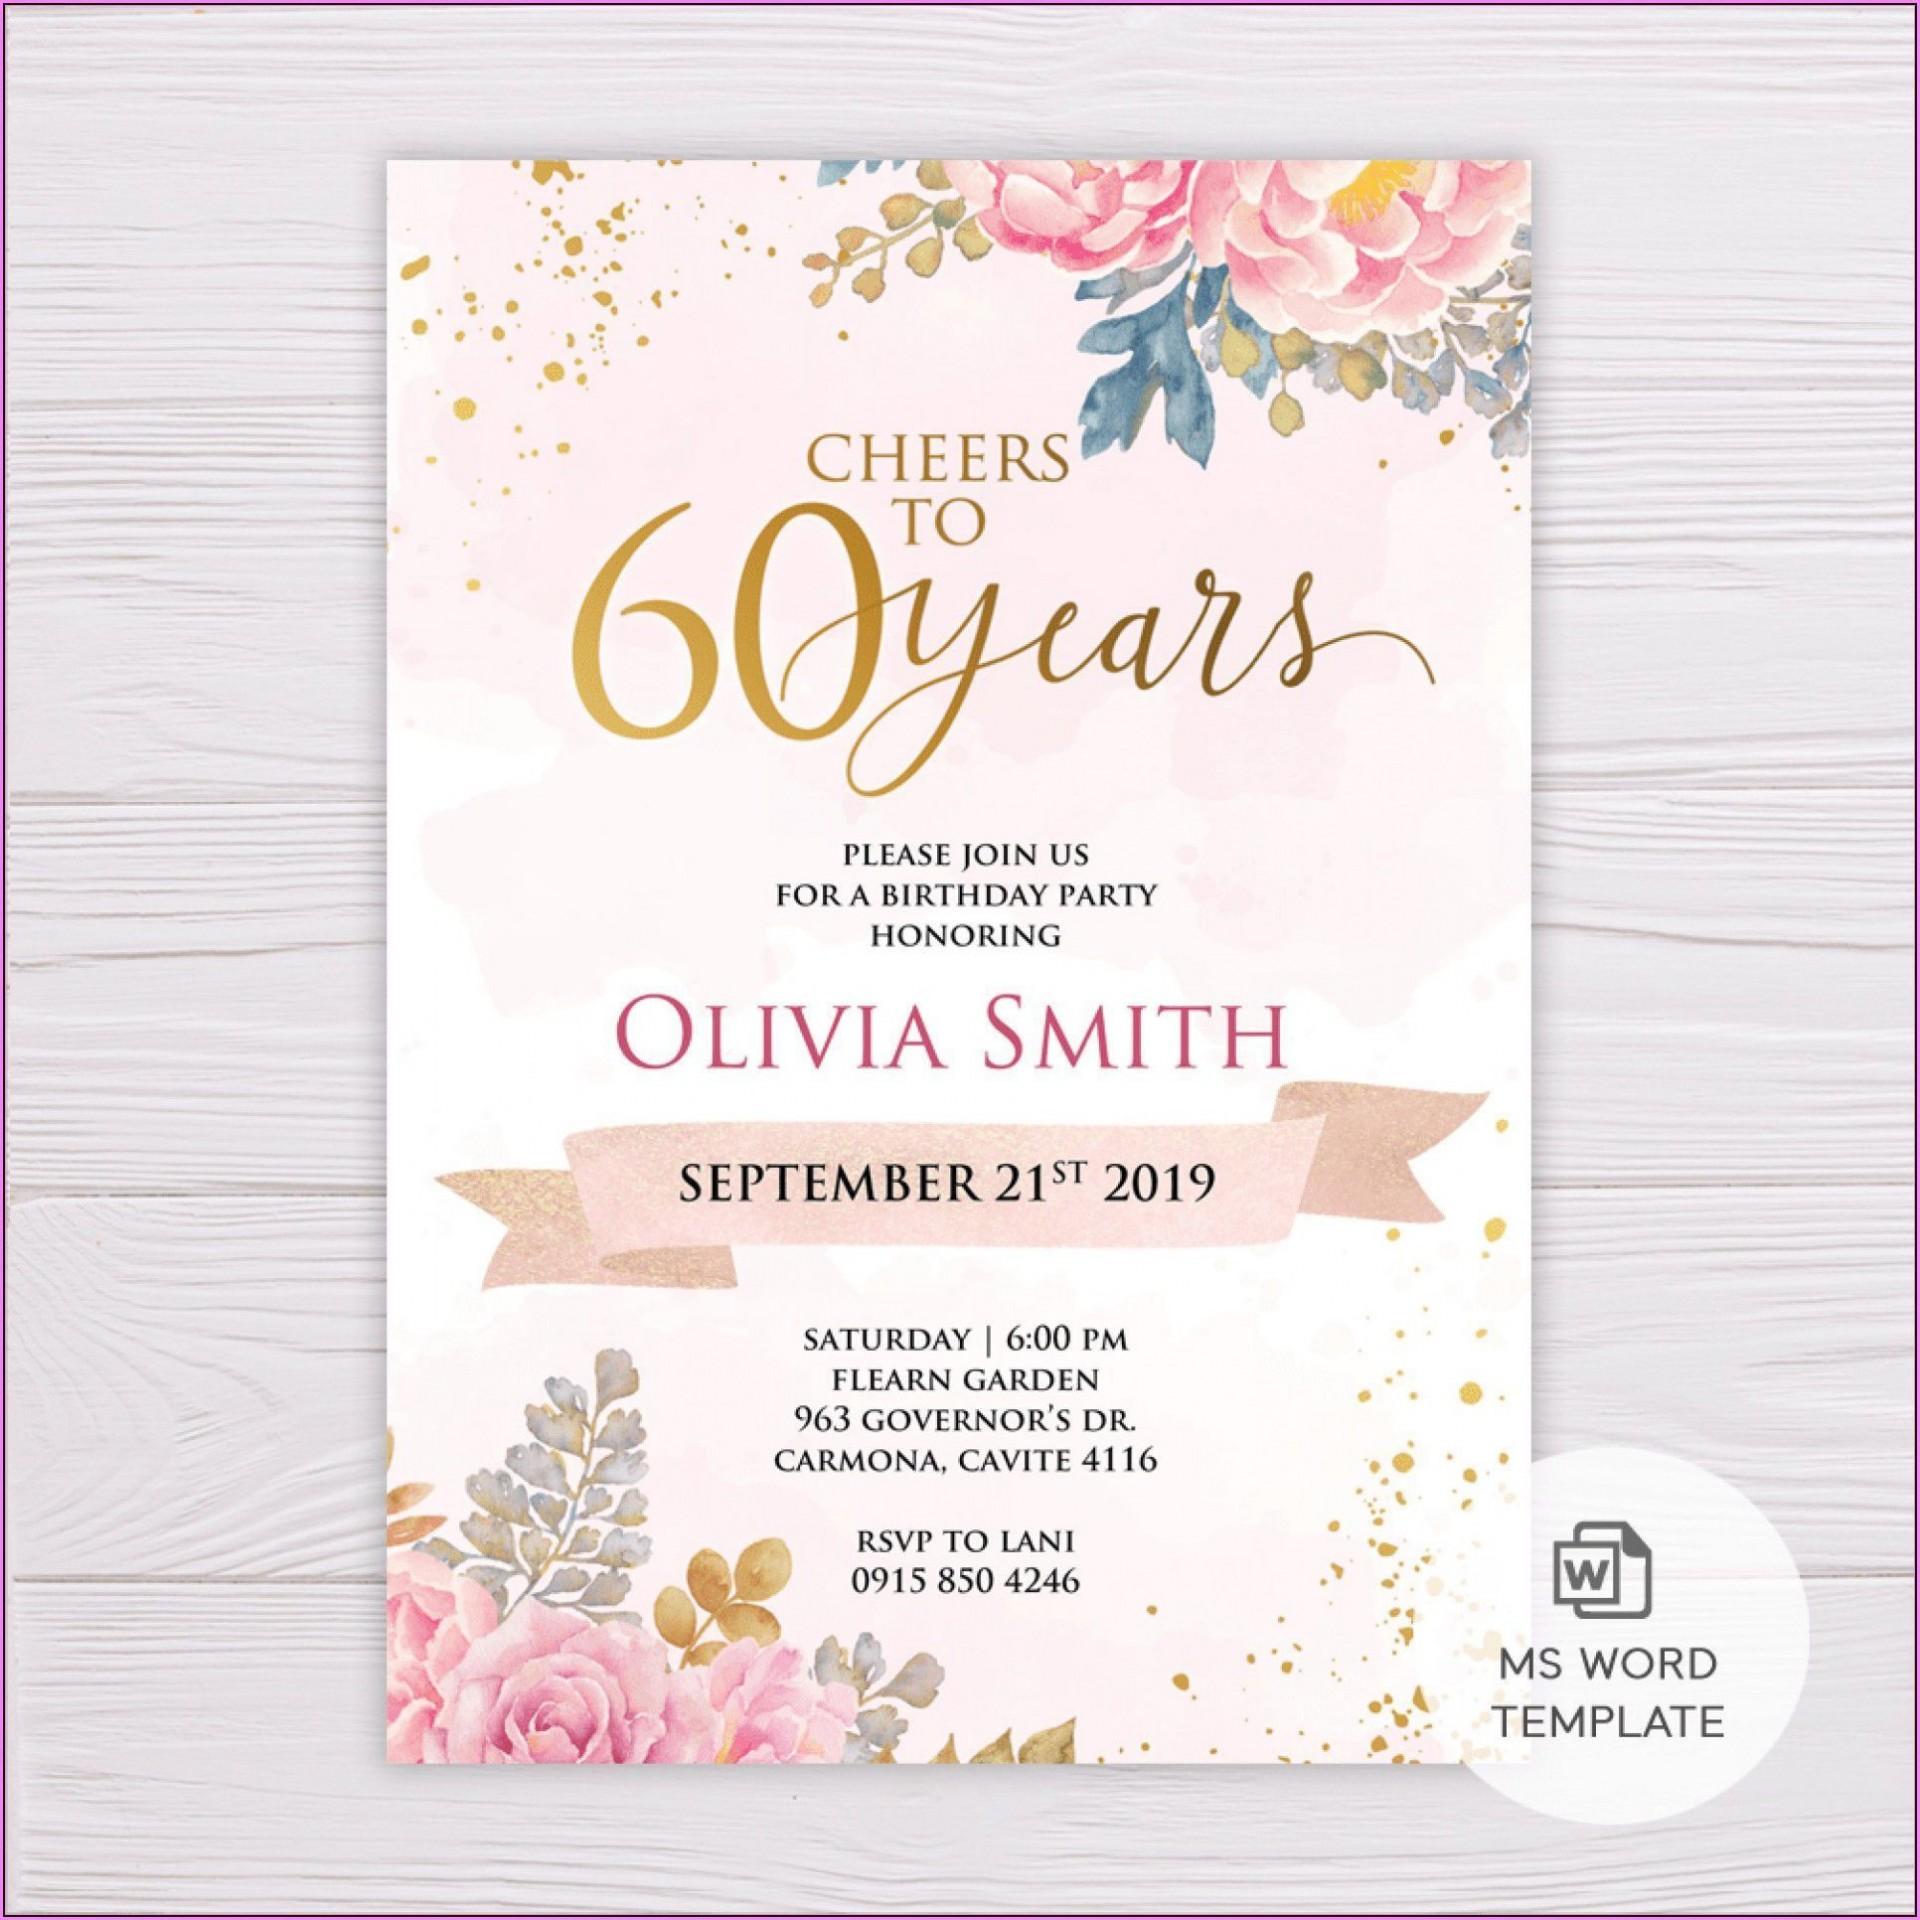 011 Wondrou 60 Birthday Invite Template High Definition  Templates 60th Printable Free1920